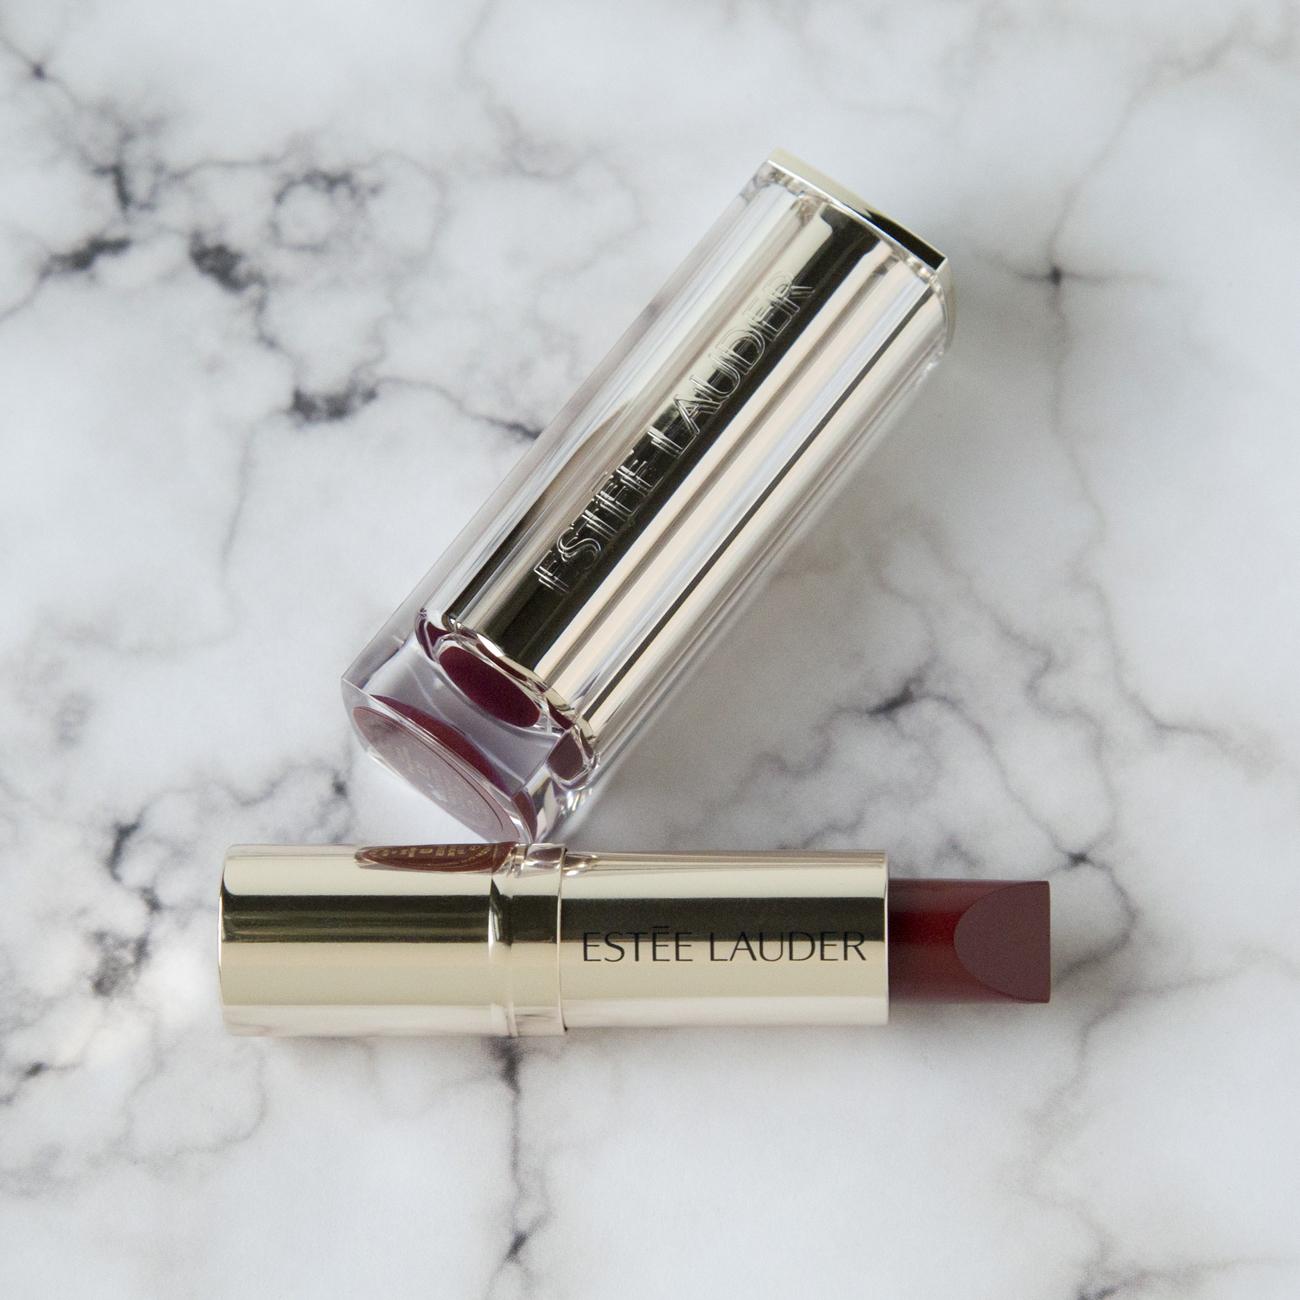 Estée Lauder Pure Color Love Lipstick in Rose Xcess